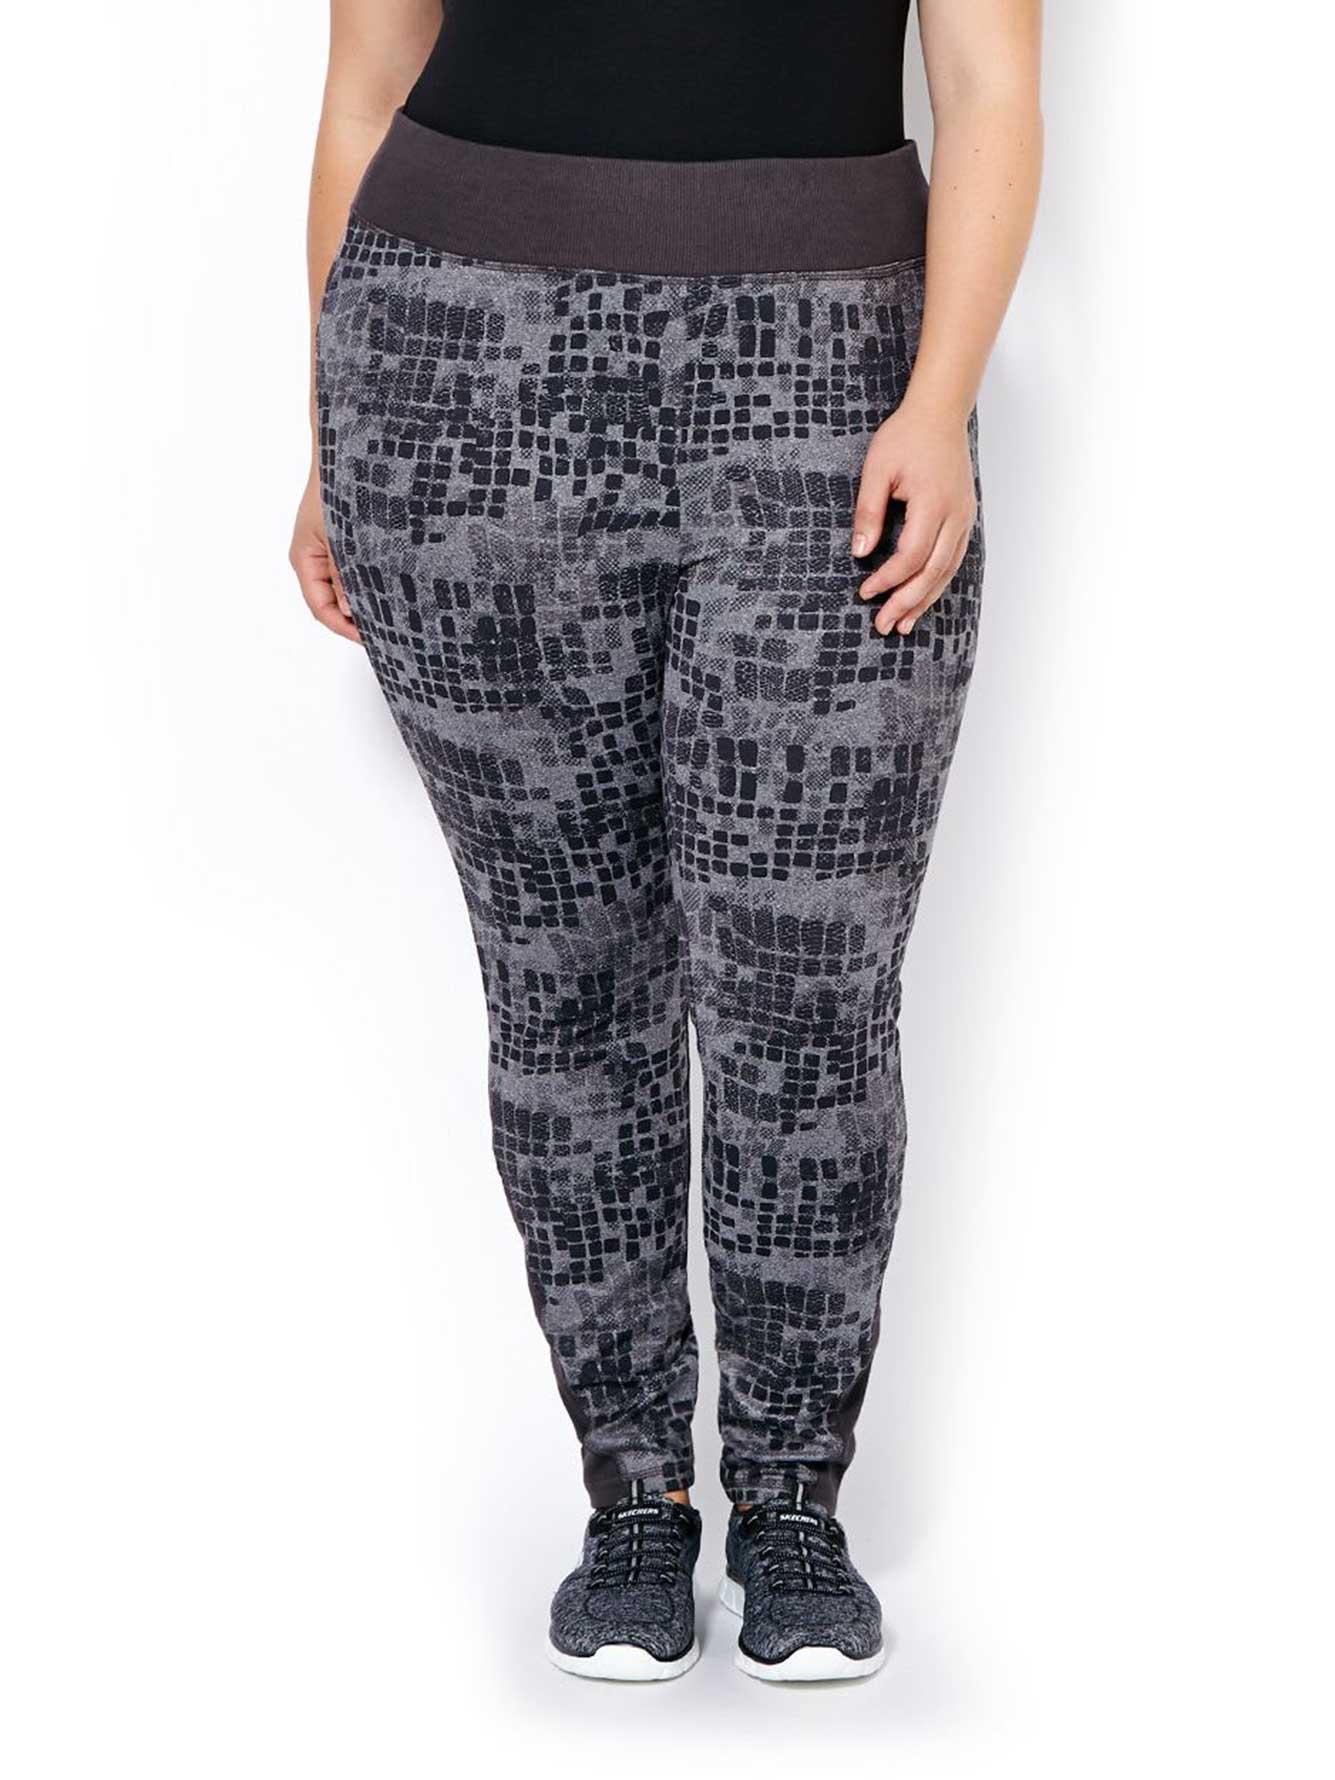 1adb3902890 Sports - Plus-Size Printed Legging